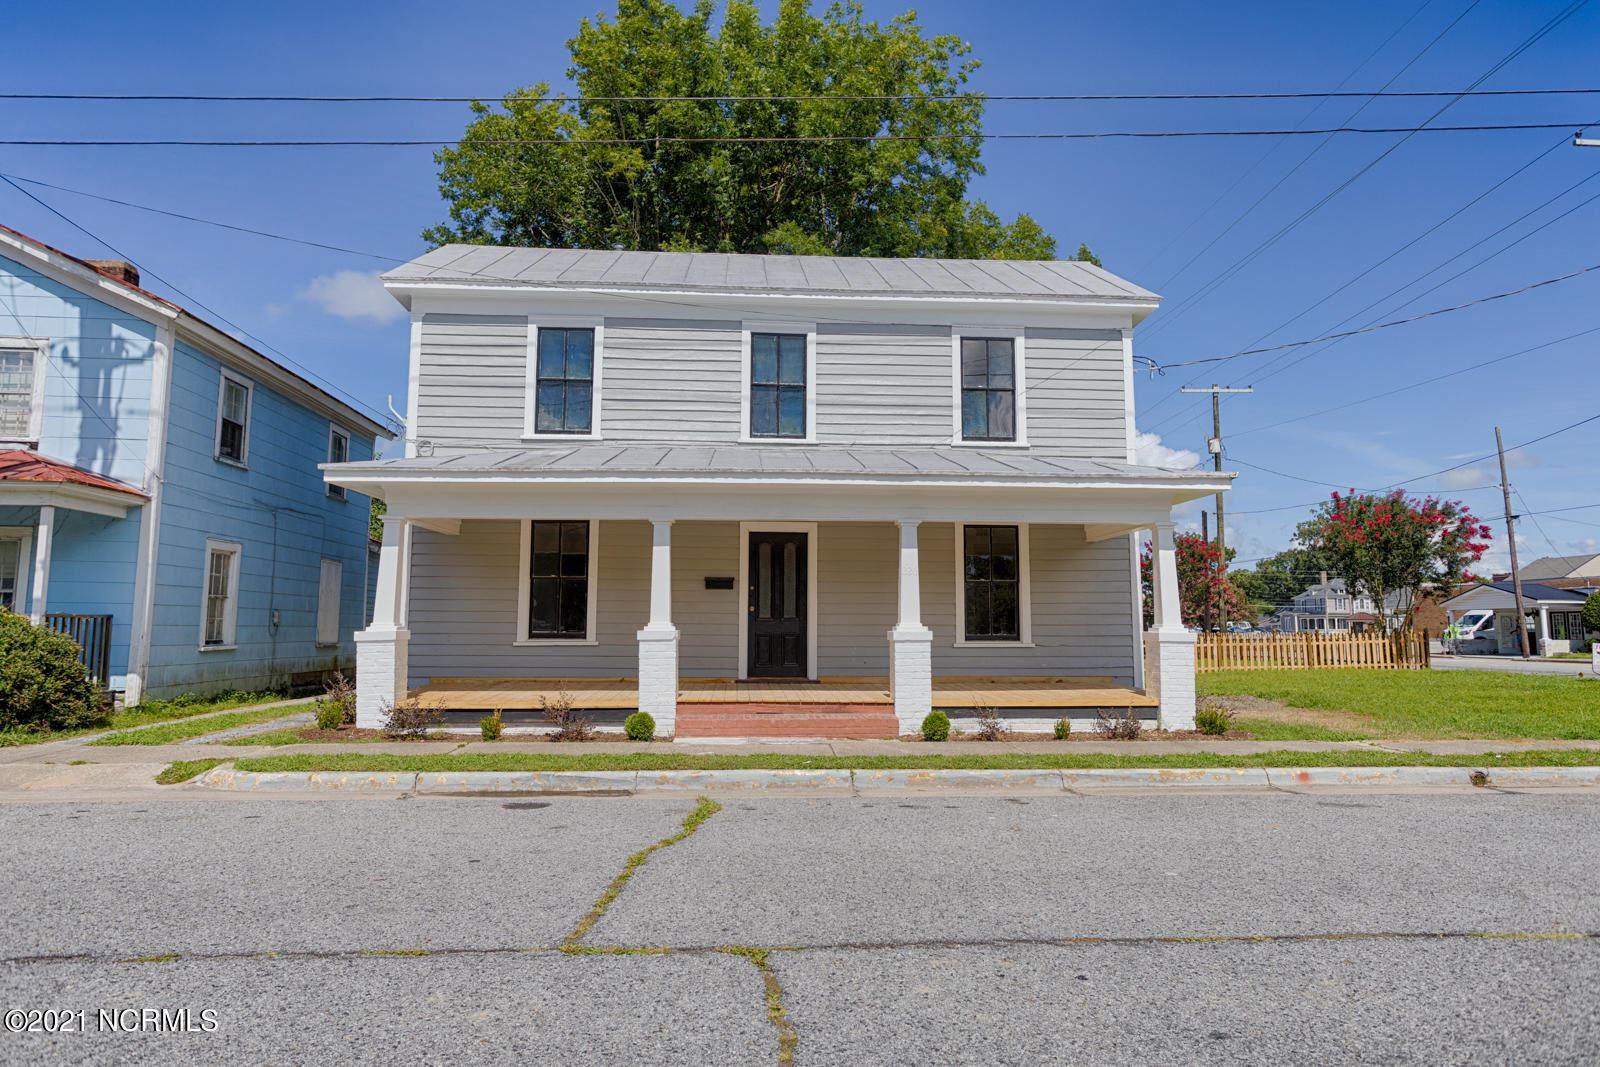 Photo of 226 N Bonner Street, Washington, NC 27889 (MLS # 100286606)